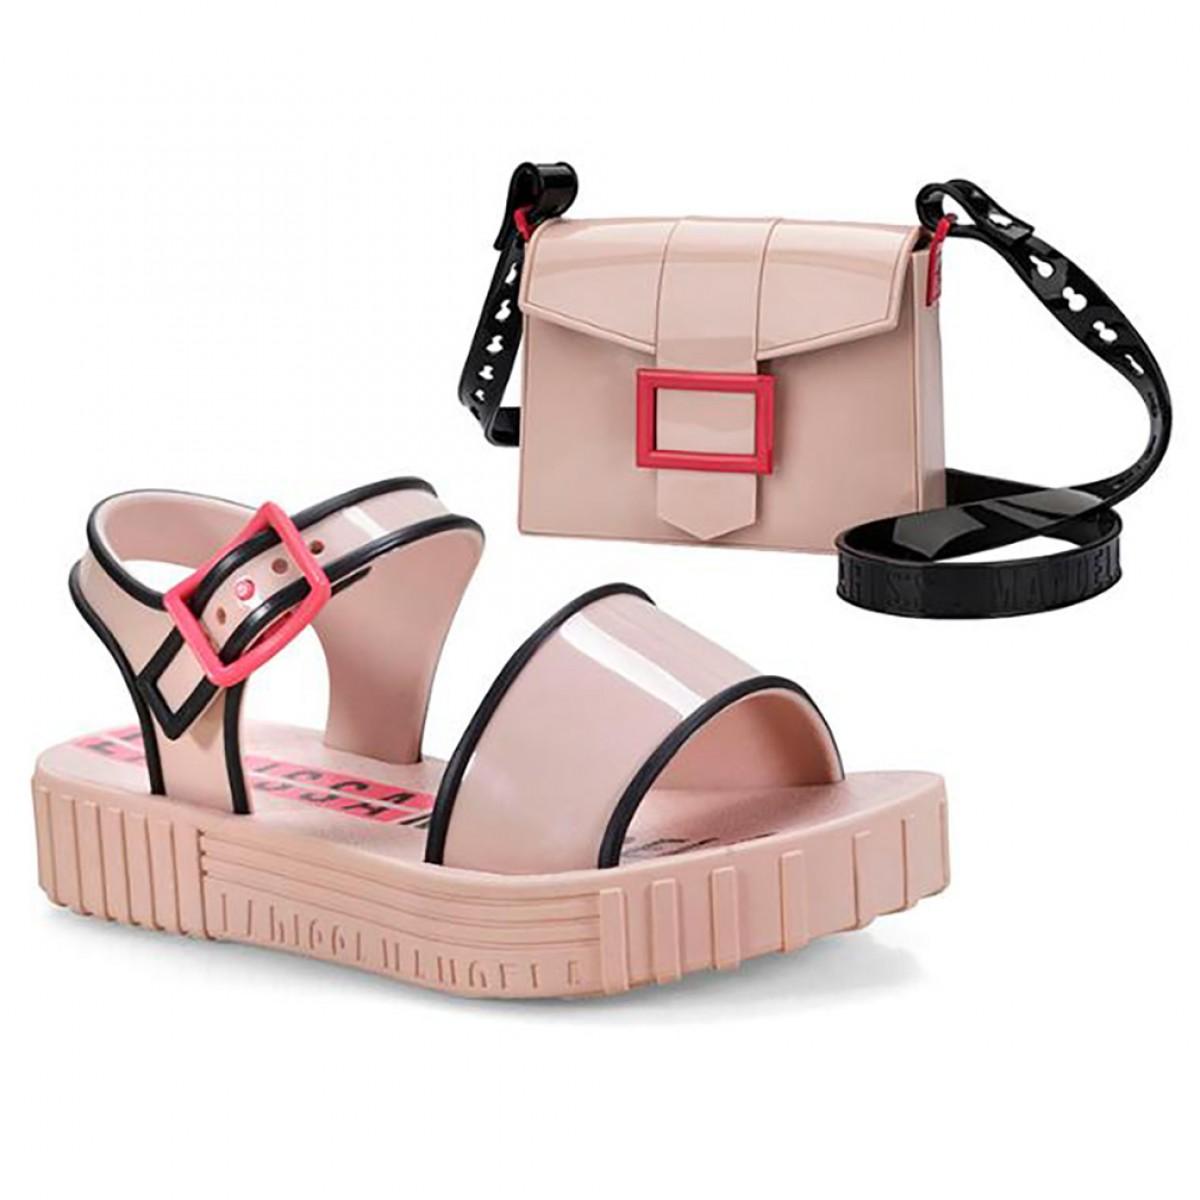 7b71870bfeb06 Sandália Larissa Manoela Fashion Grendene Infantil Rosa - Compre ...